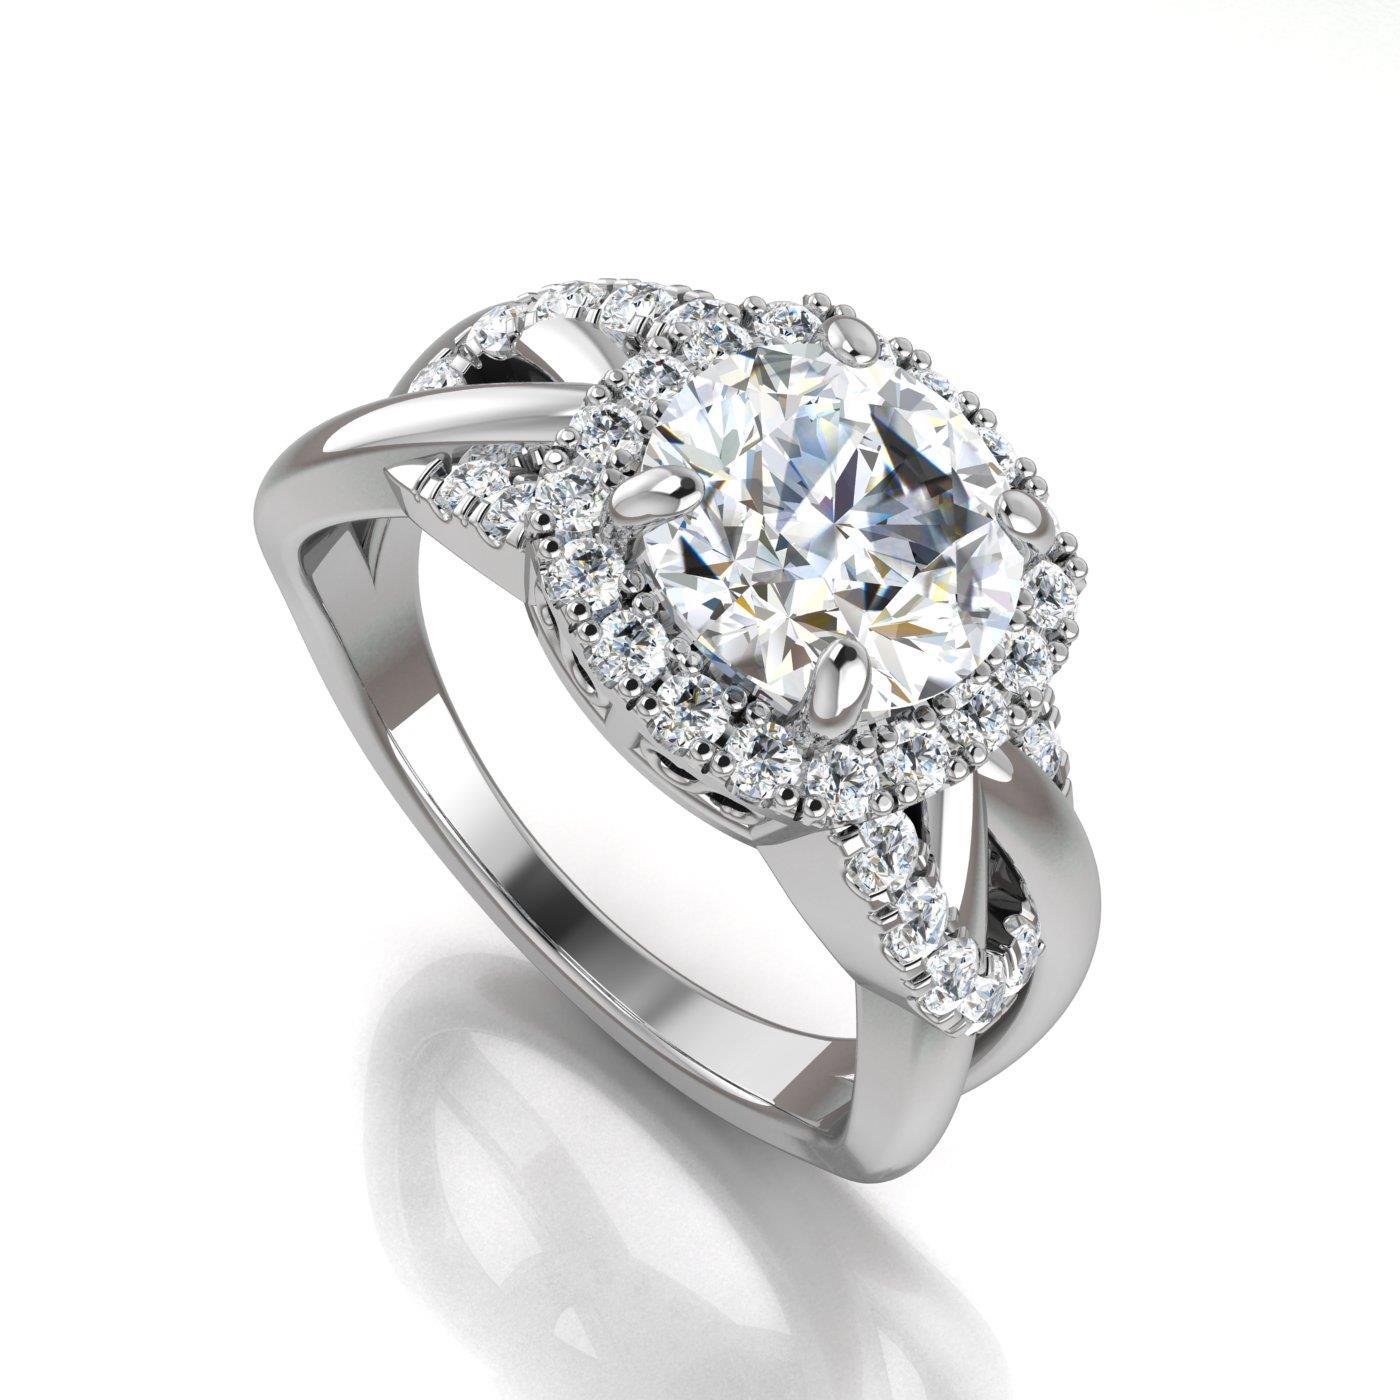 Certified 1.45 Ct White Round Cut Bridal Wedding Engagement Ring 14k White Gold Engagement & Wedding Diamond